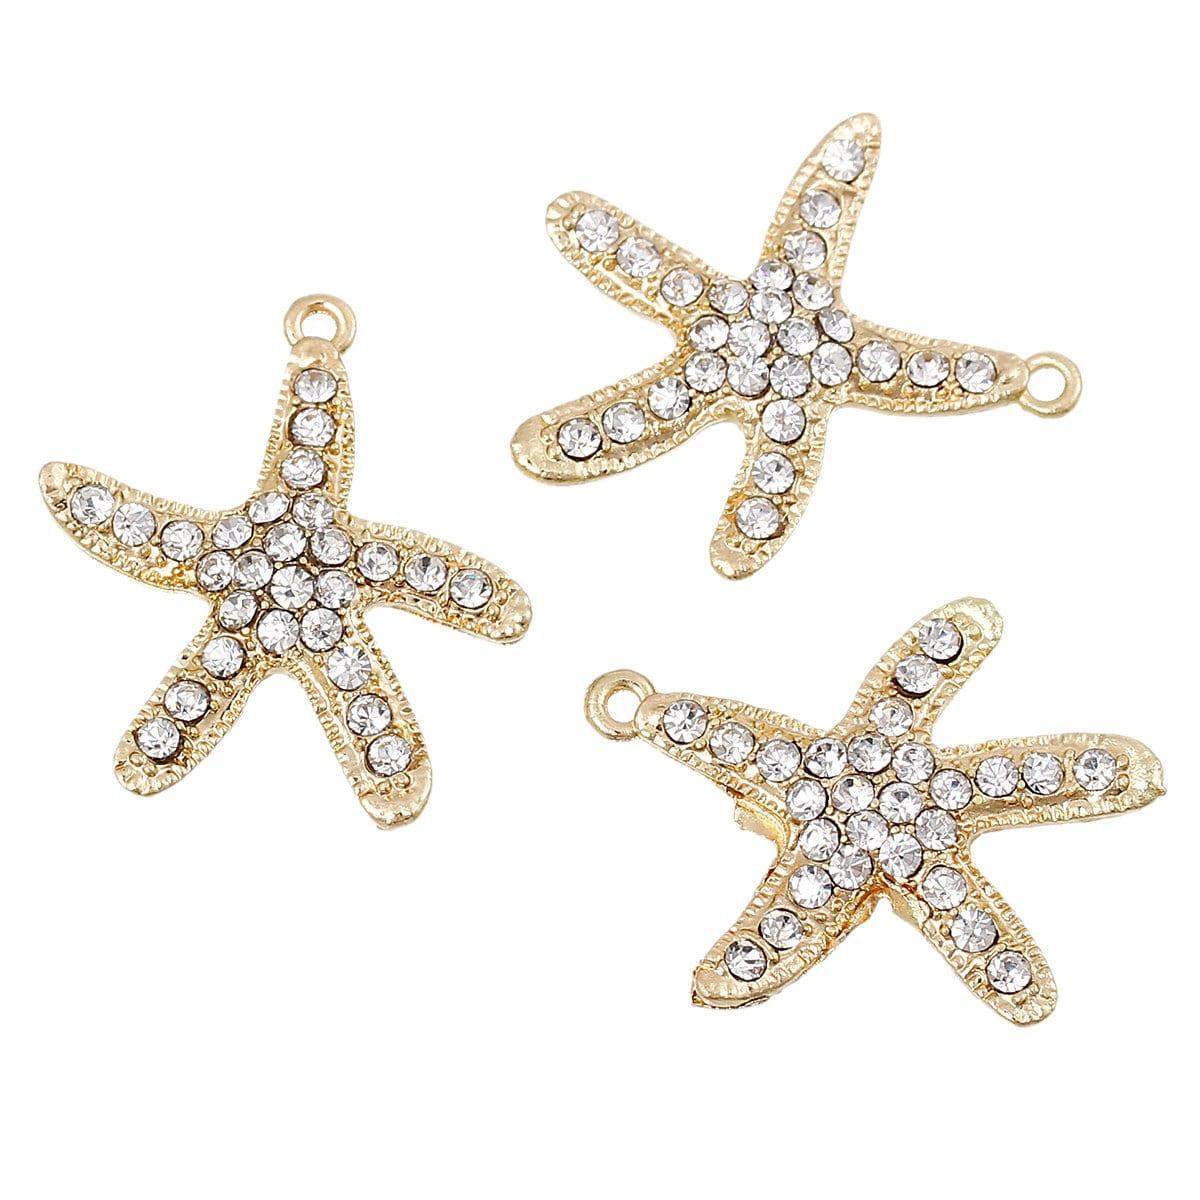 2 gold plated starfish charm pendants with rhinestones